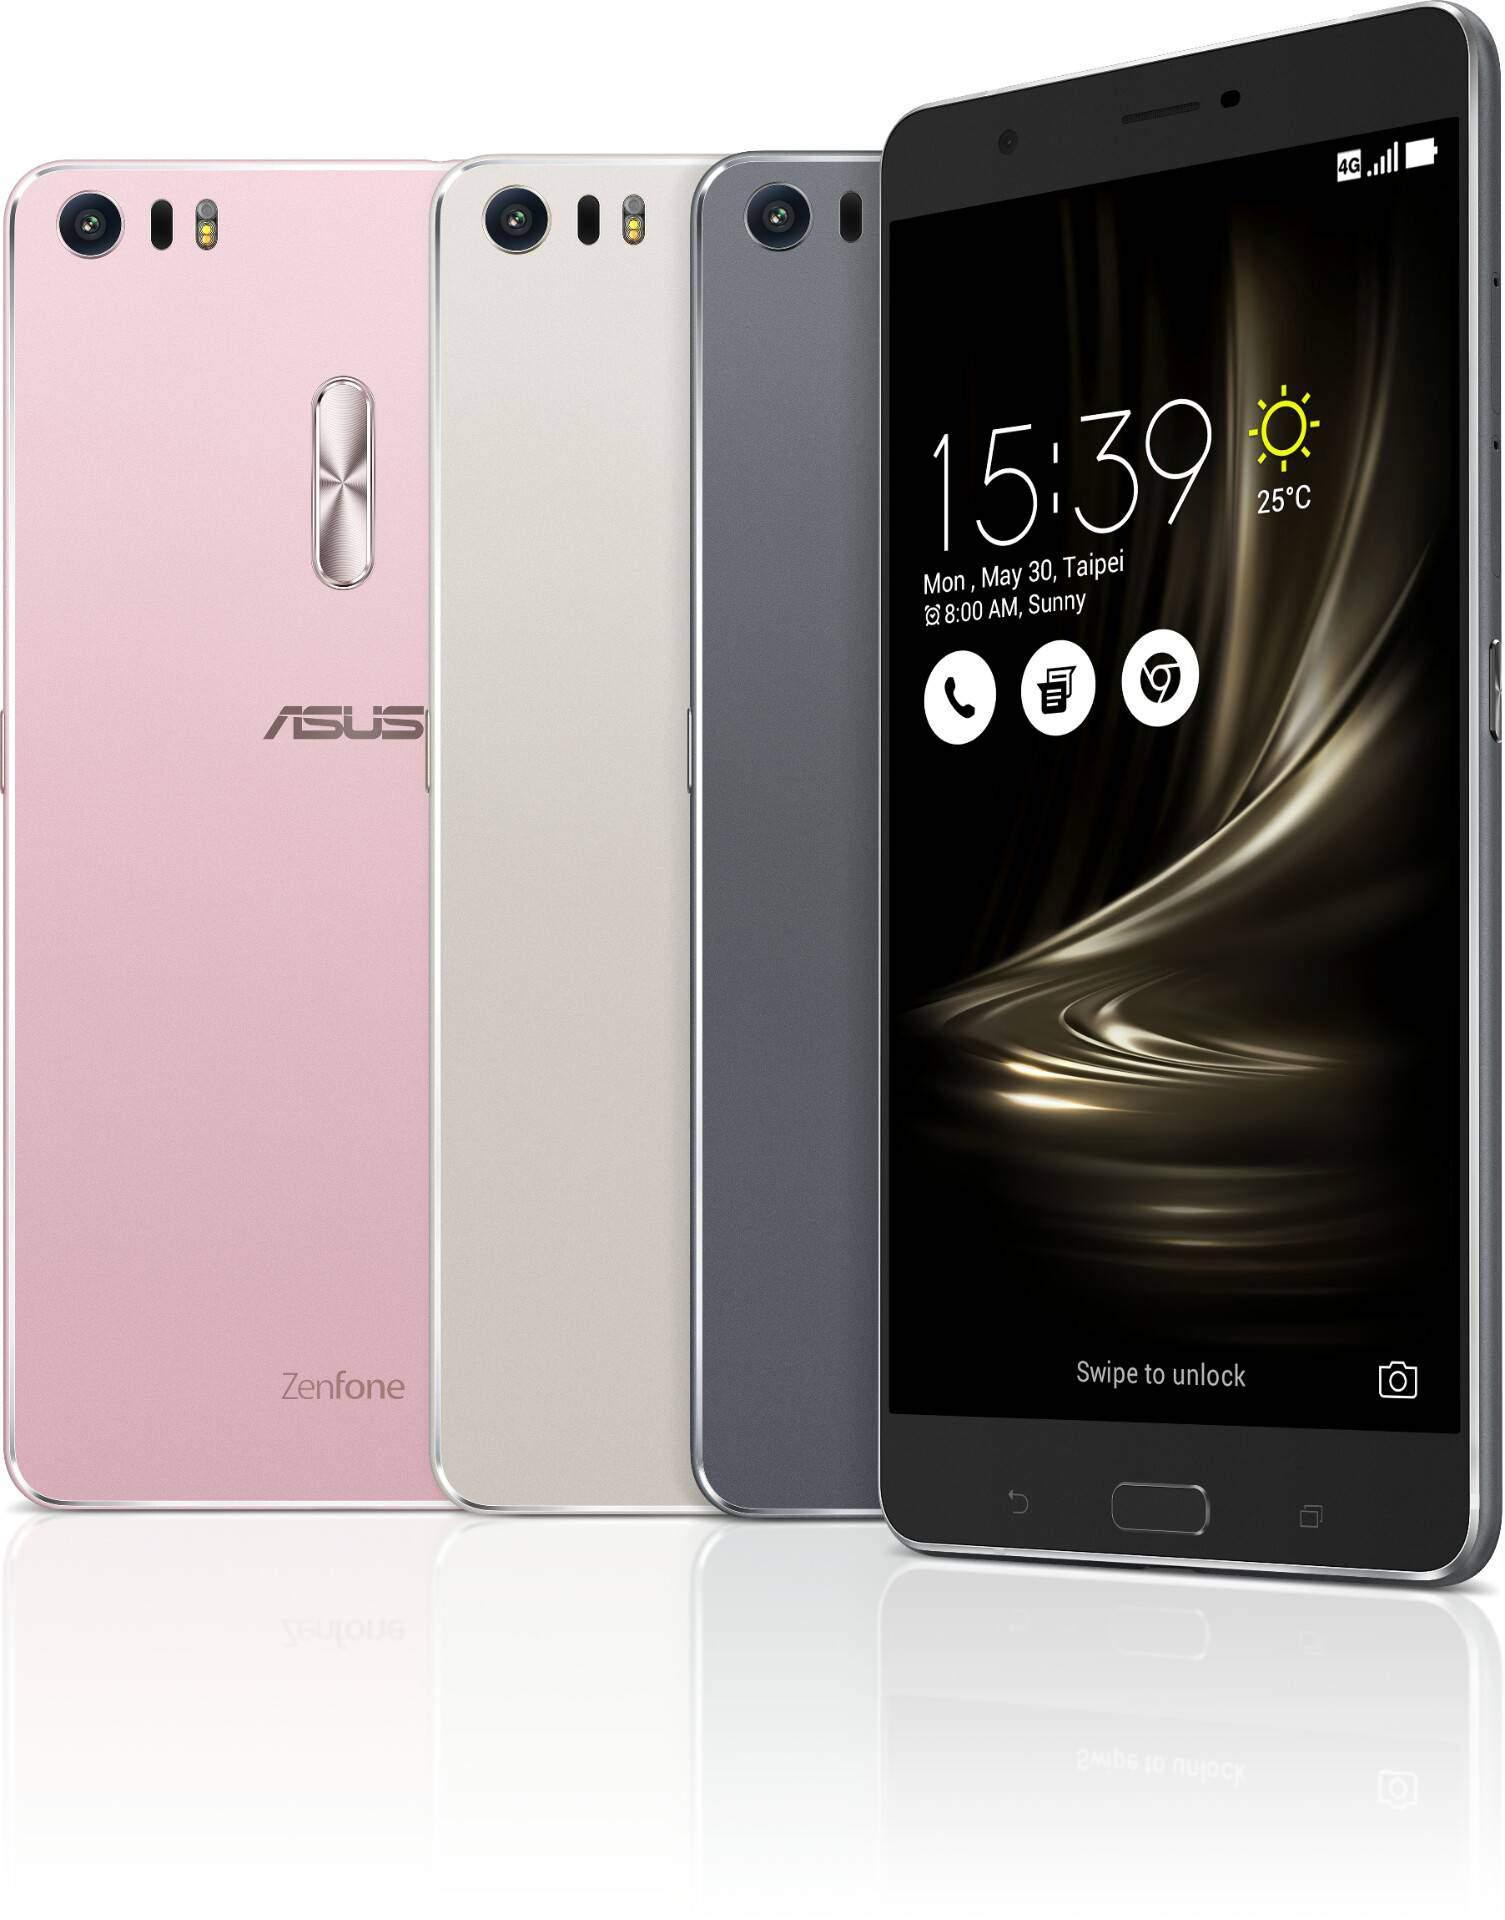 ASUS ZenFone 3 Ultra 1